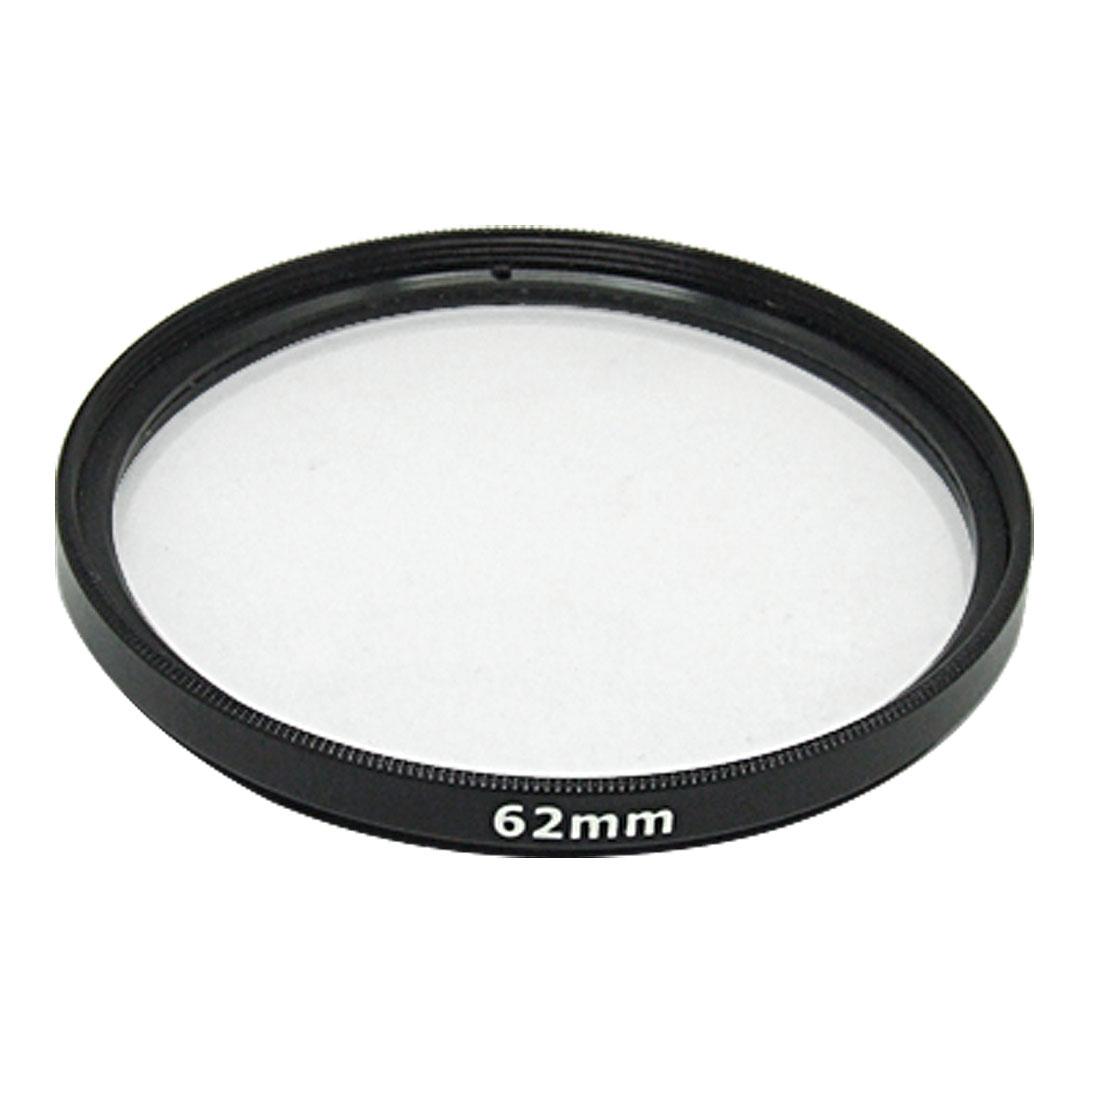 62mm +1 Close up Camera Lens Filter for SLR Camera